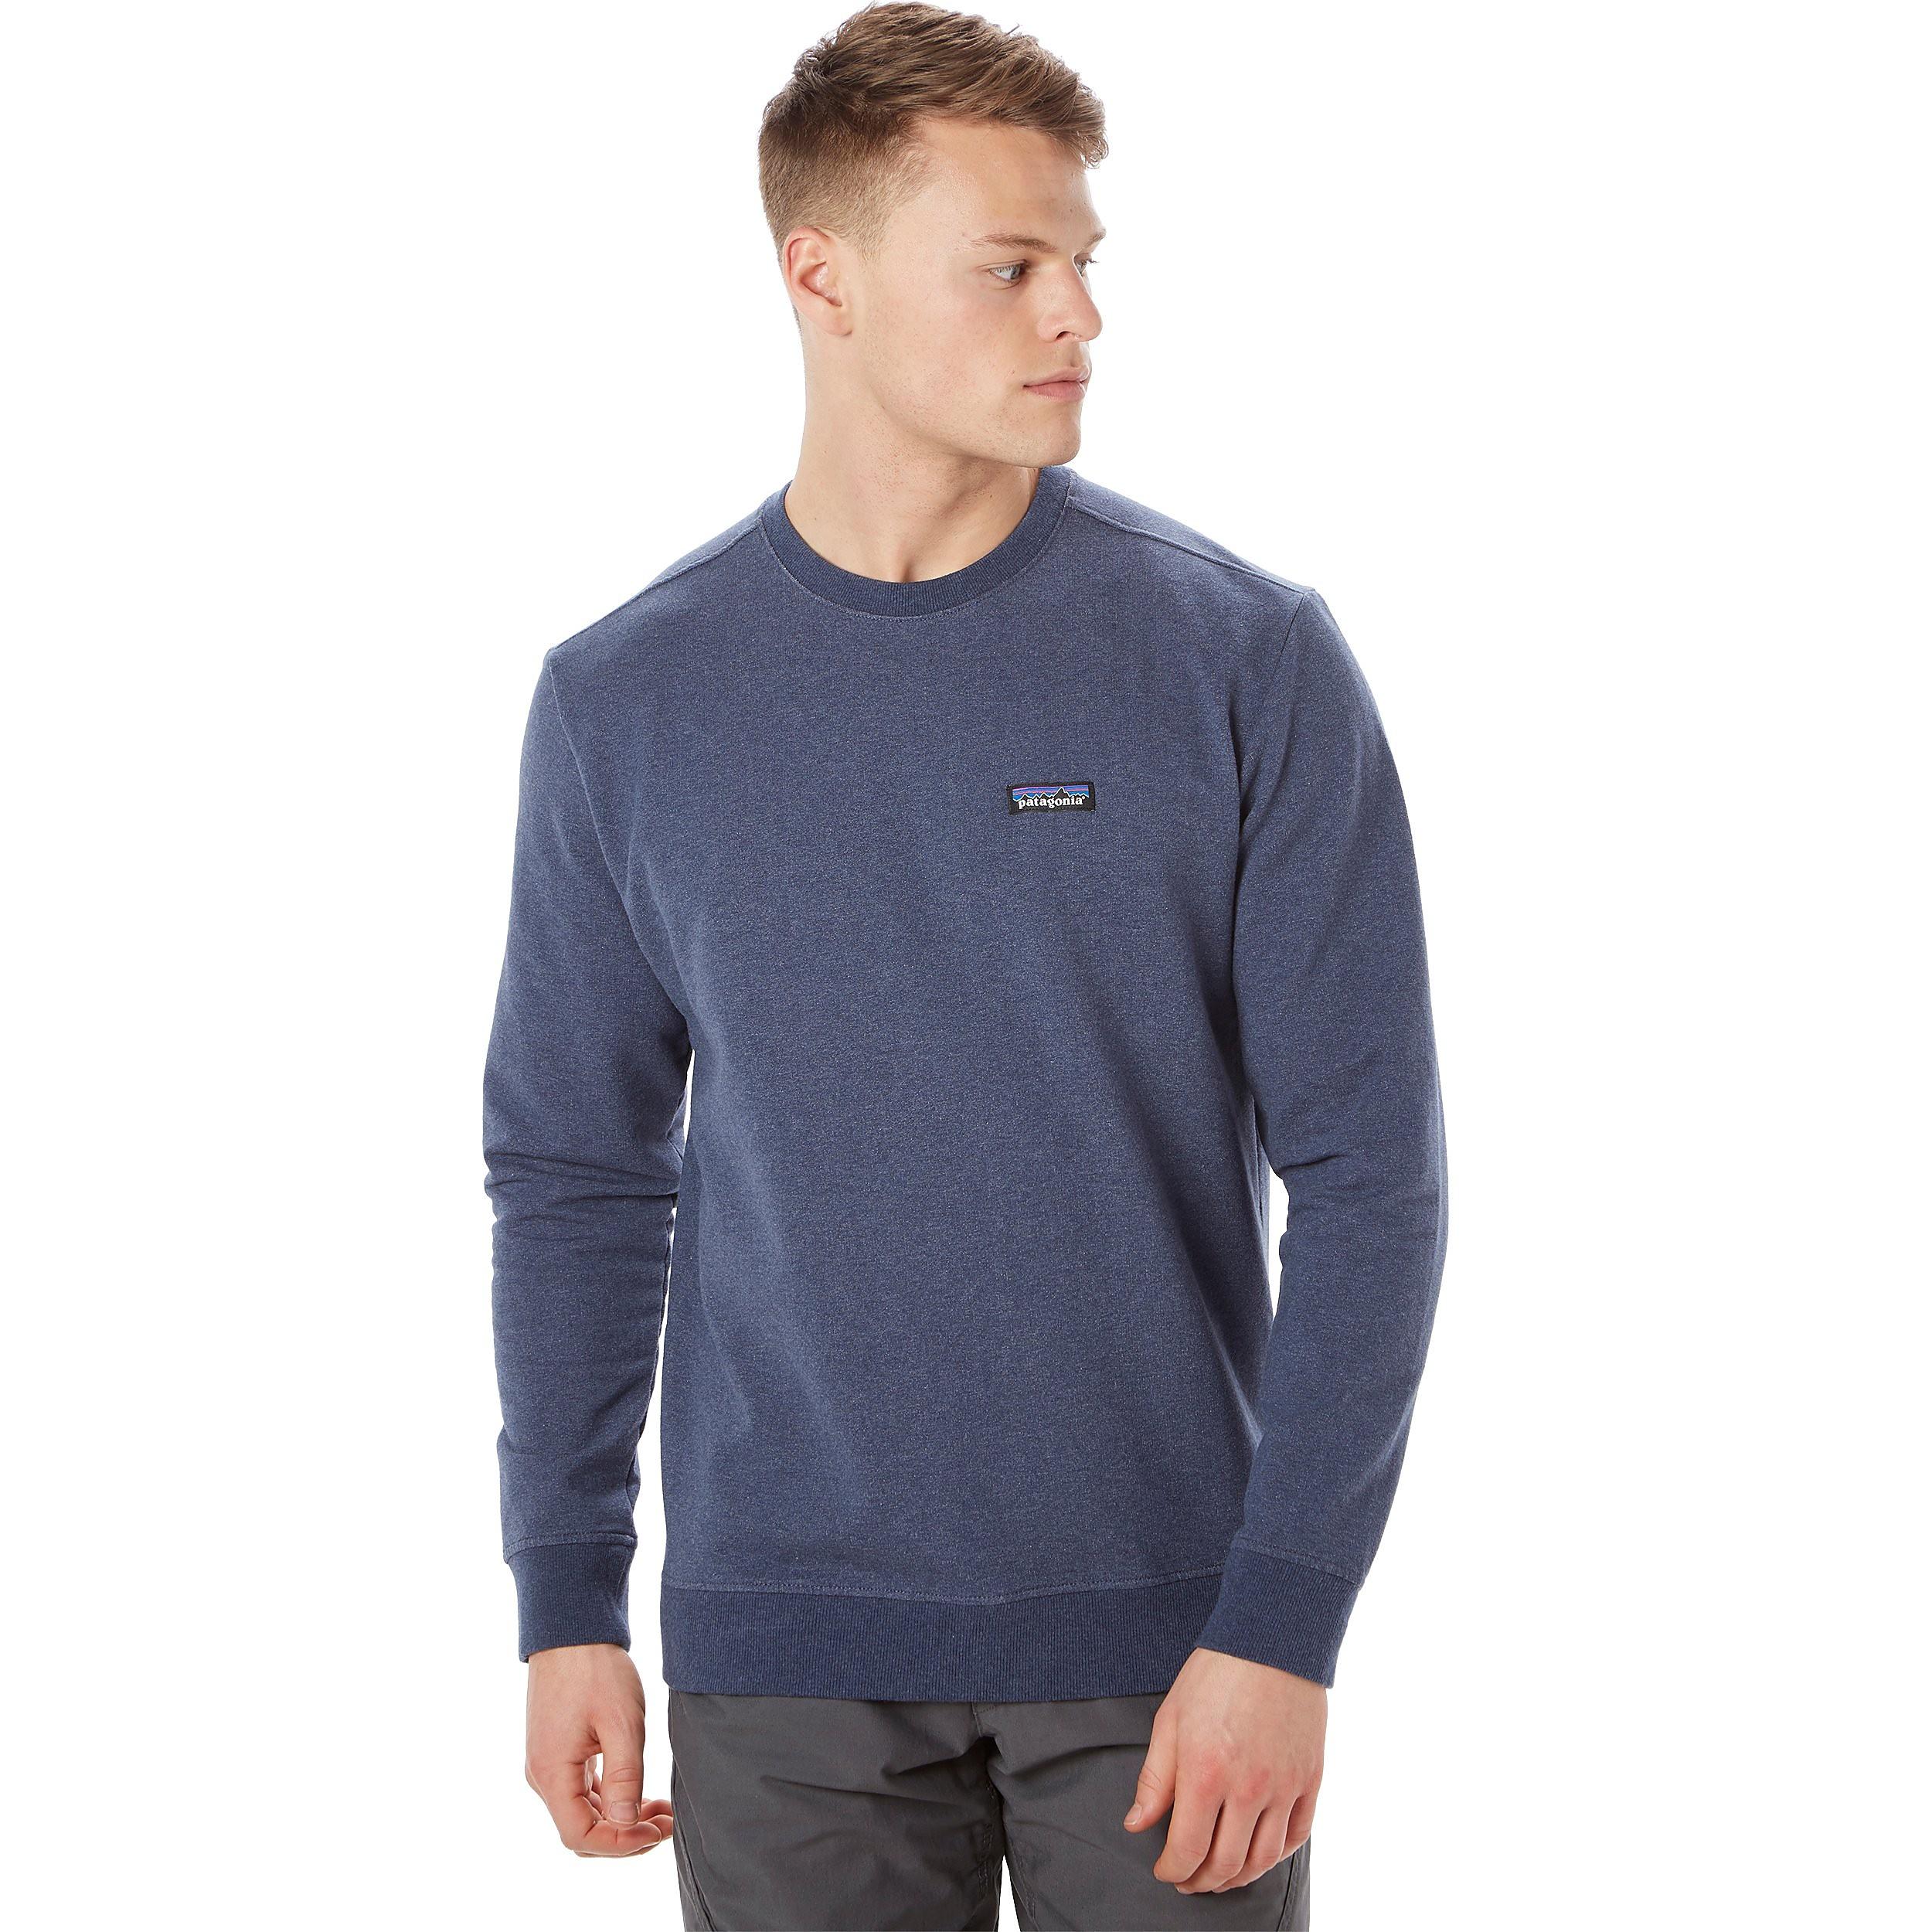 Patagonia P-6 Label Midweight Crew Men's Sweatshirt Tops